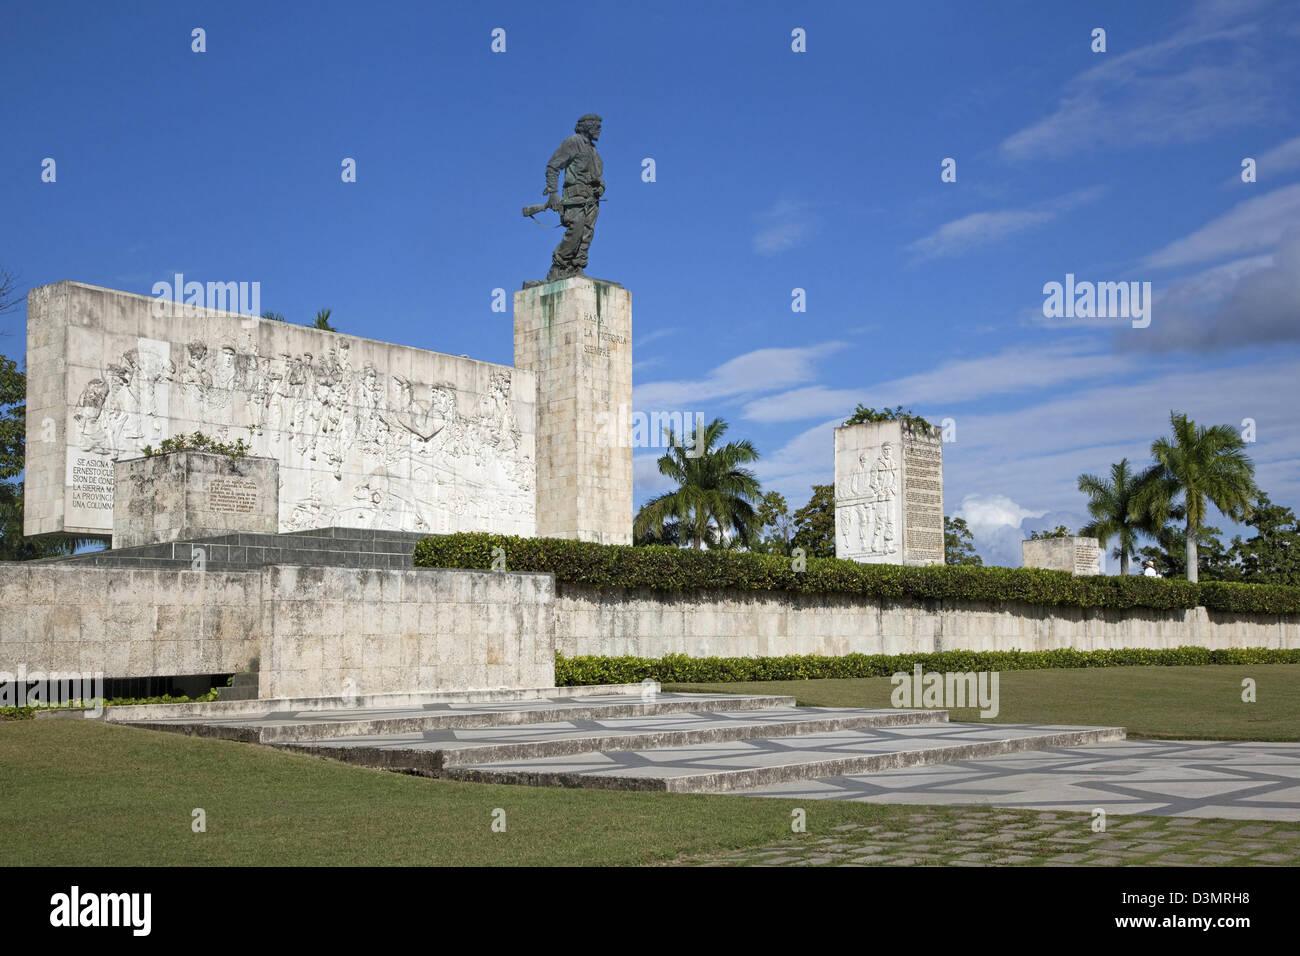 Che Denkmal und Mausoleum in Santa Clara, Villa Clara, Kuba, Caribbean Stockbild